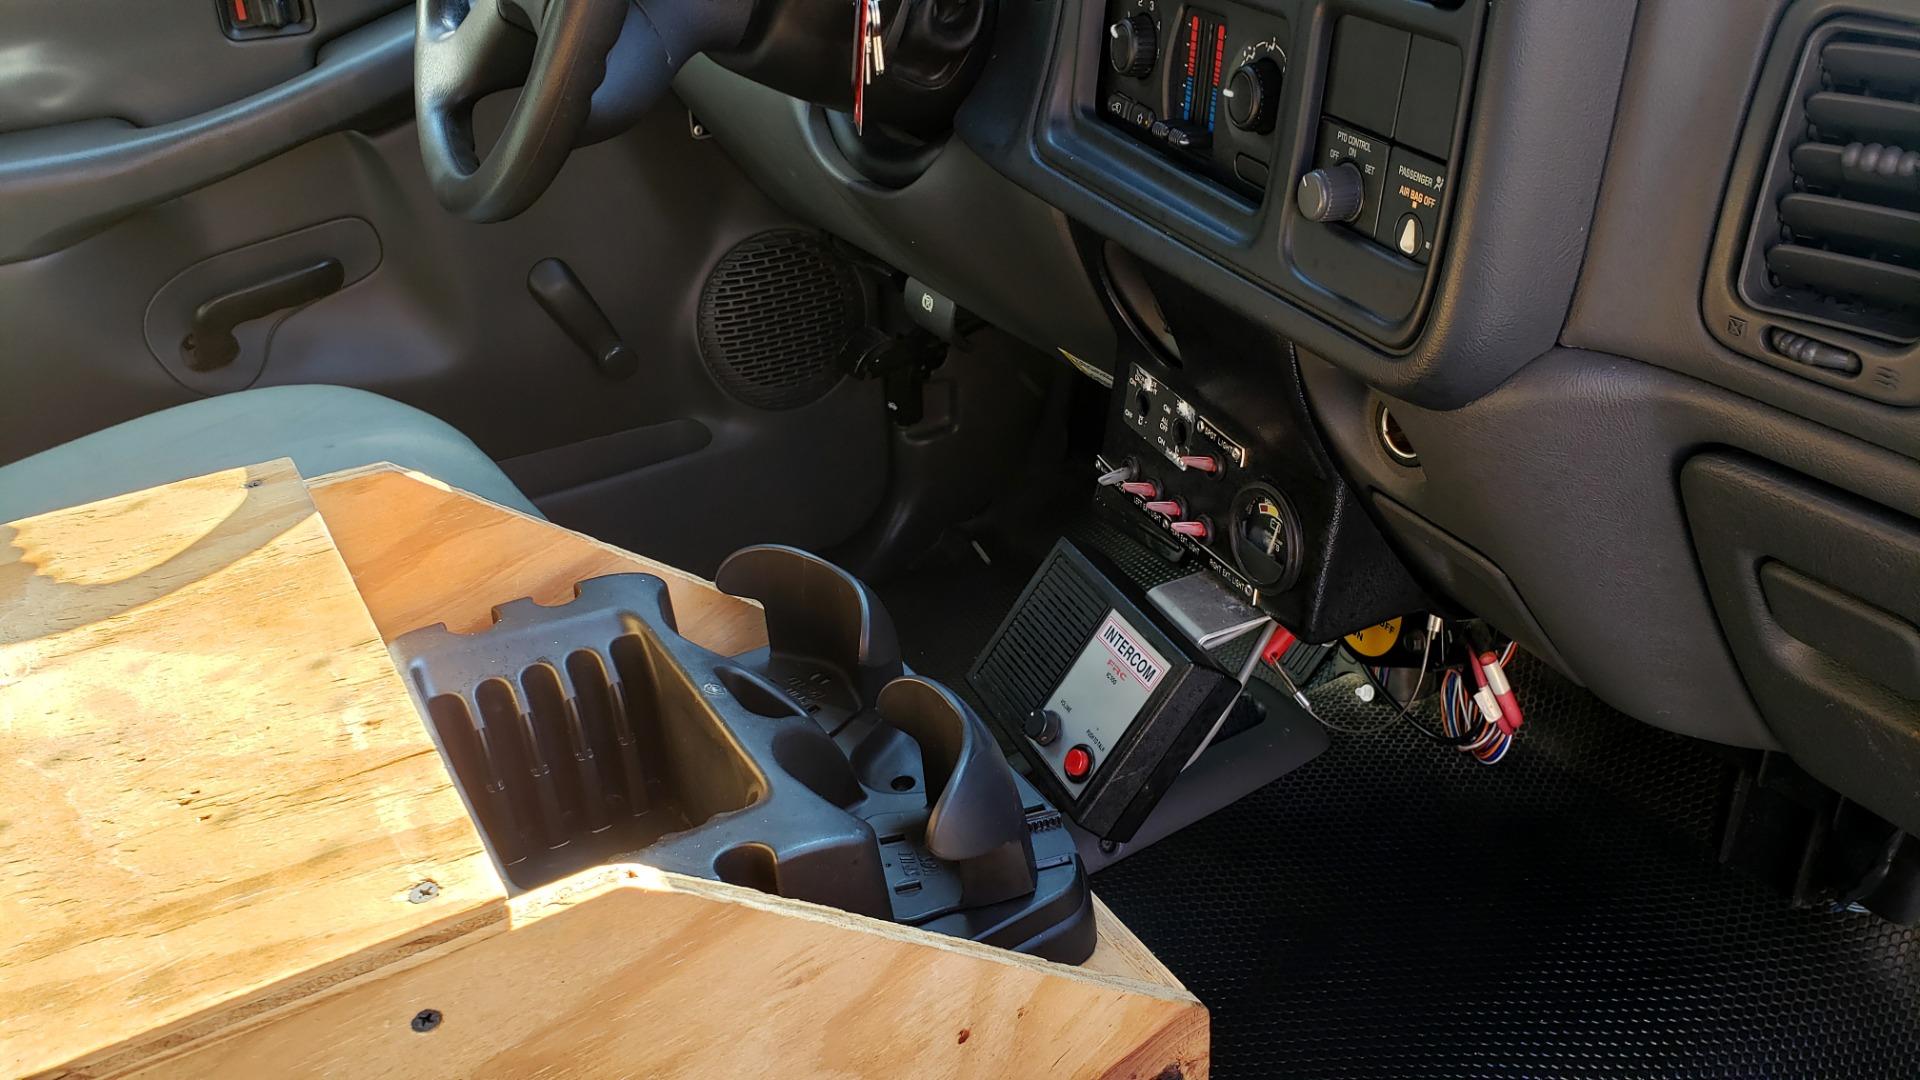 Used 2005 Chevrolet SILVERADO 3500 DRW / 4WD / REG CAB / 6.6L DURAMAX / DOOMSDAY PREPPER for sale $21,499 at Formula Imports in Charlotte NC 28227 27